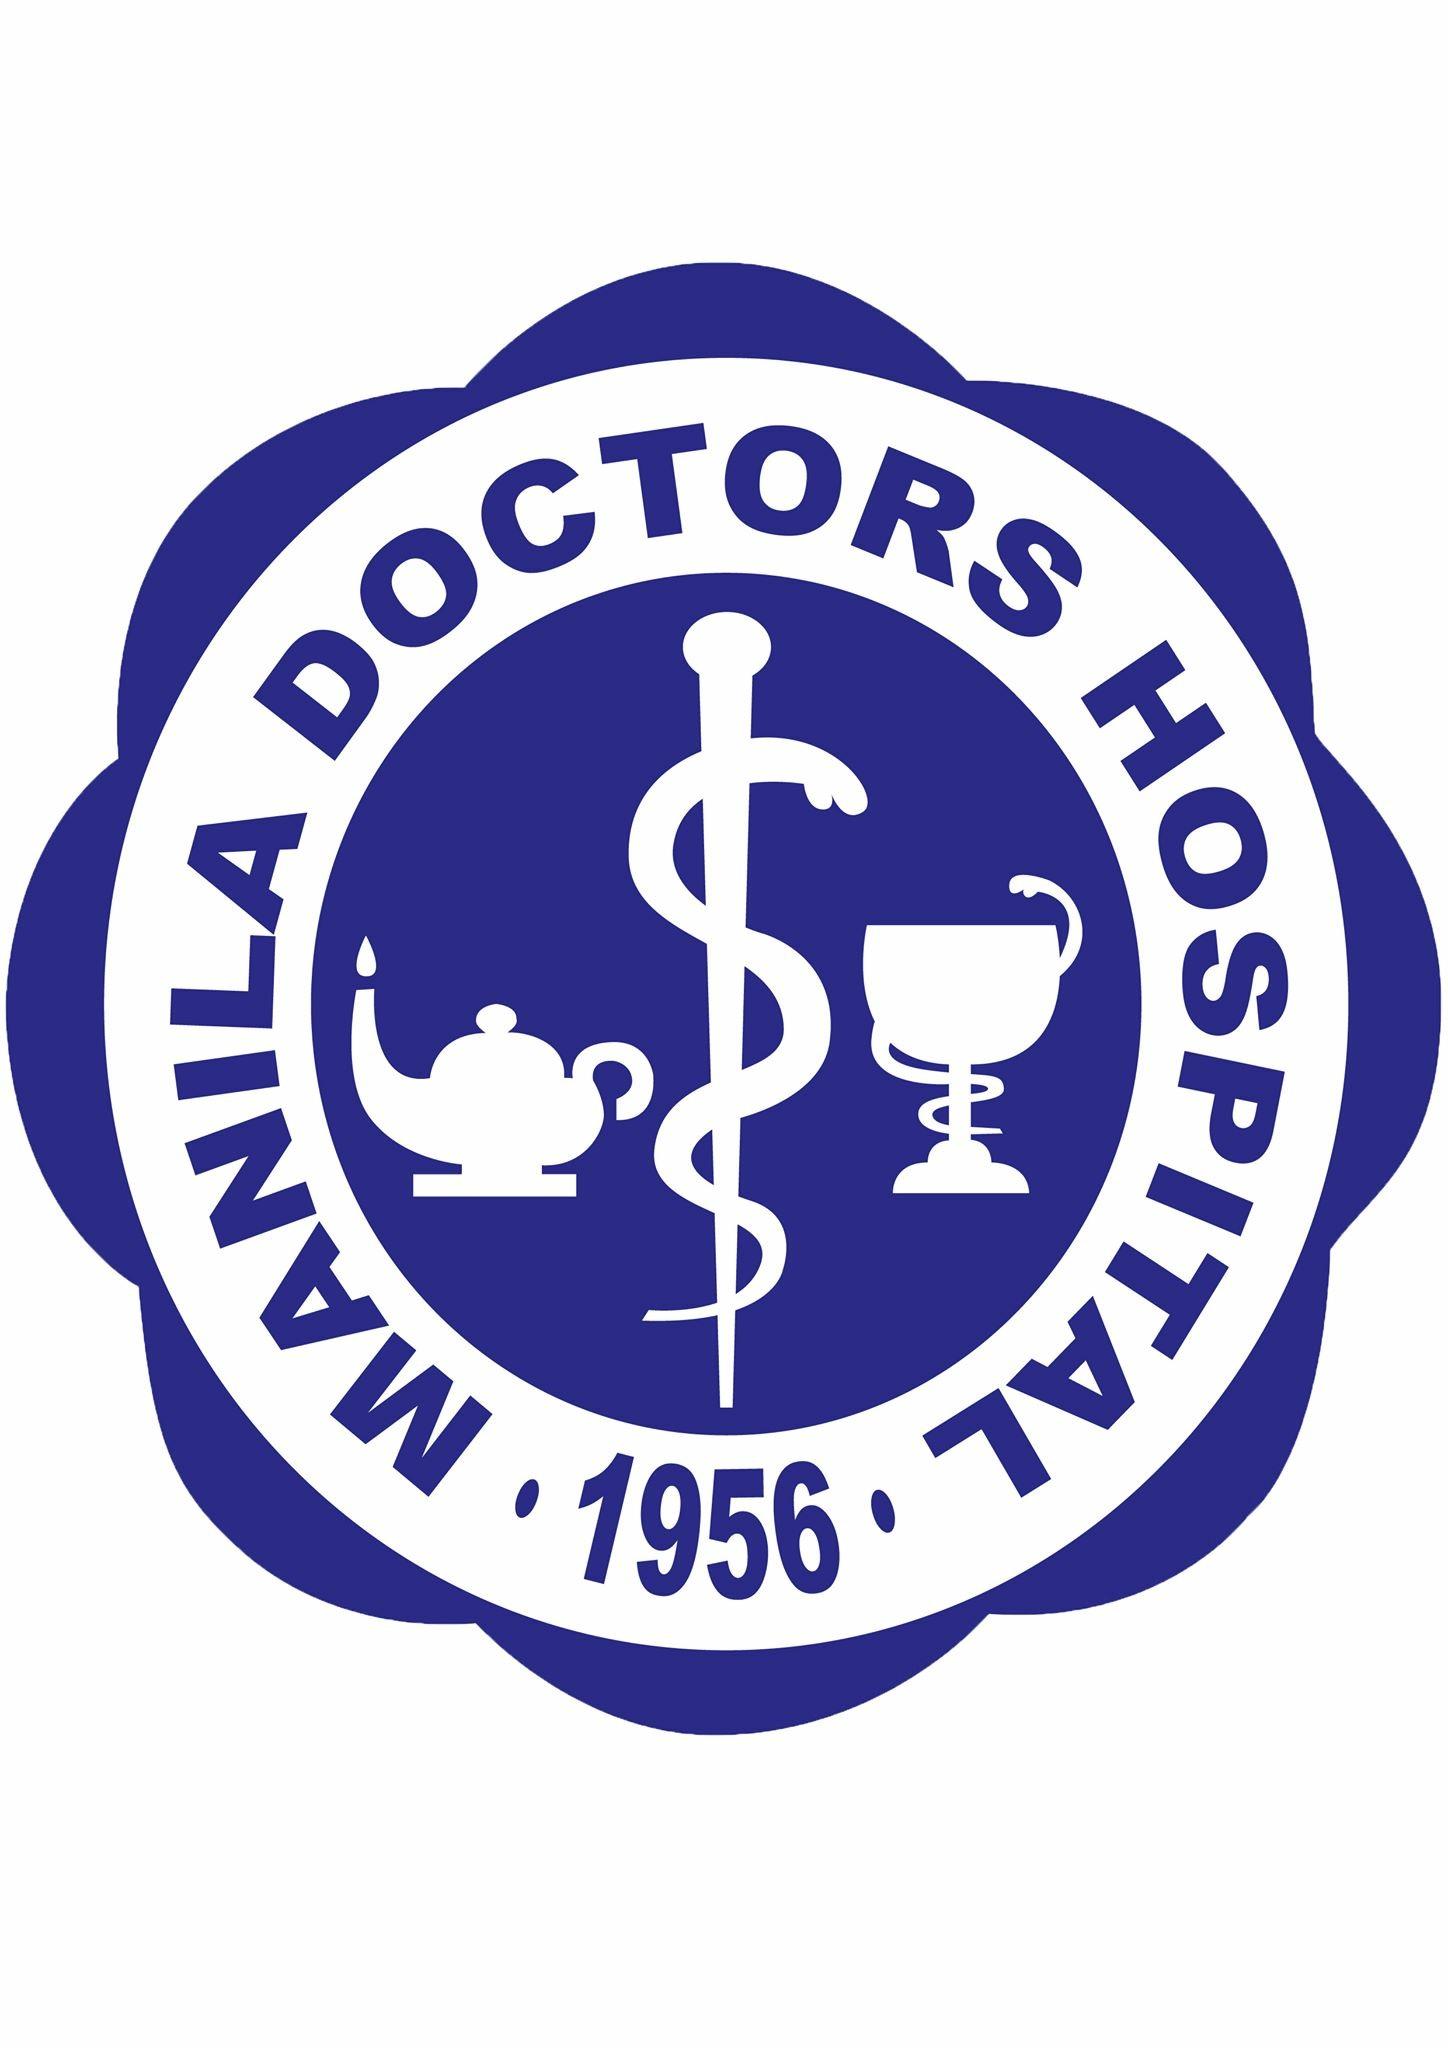 Manila Doctors Hospital - Room No. 310